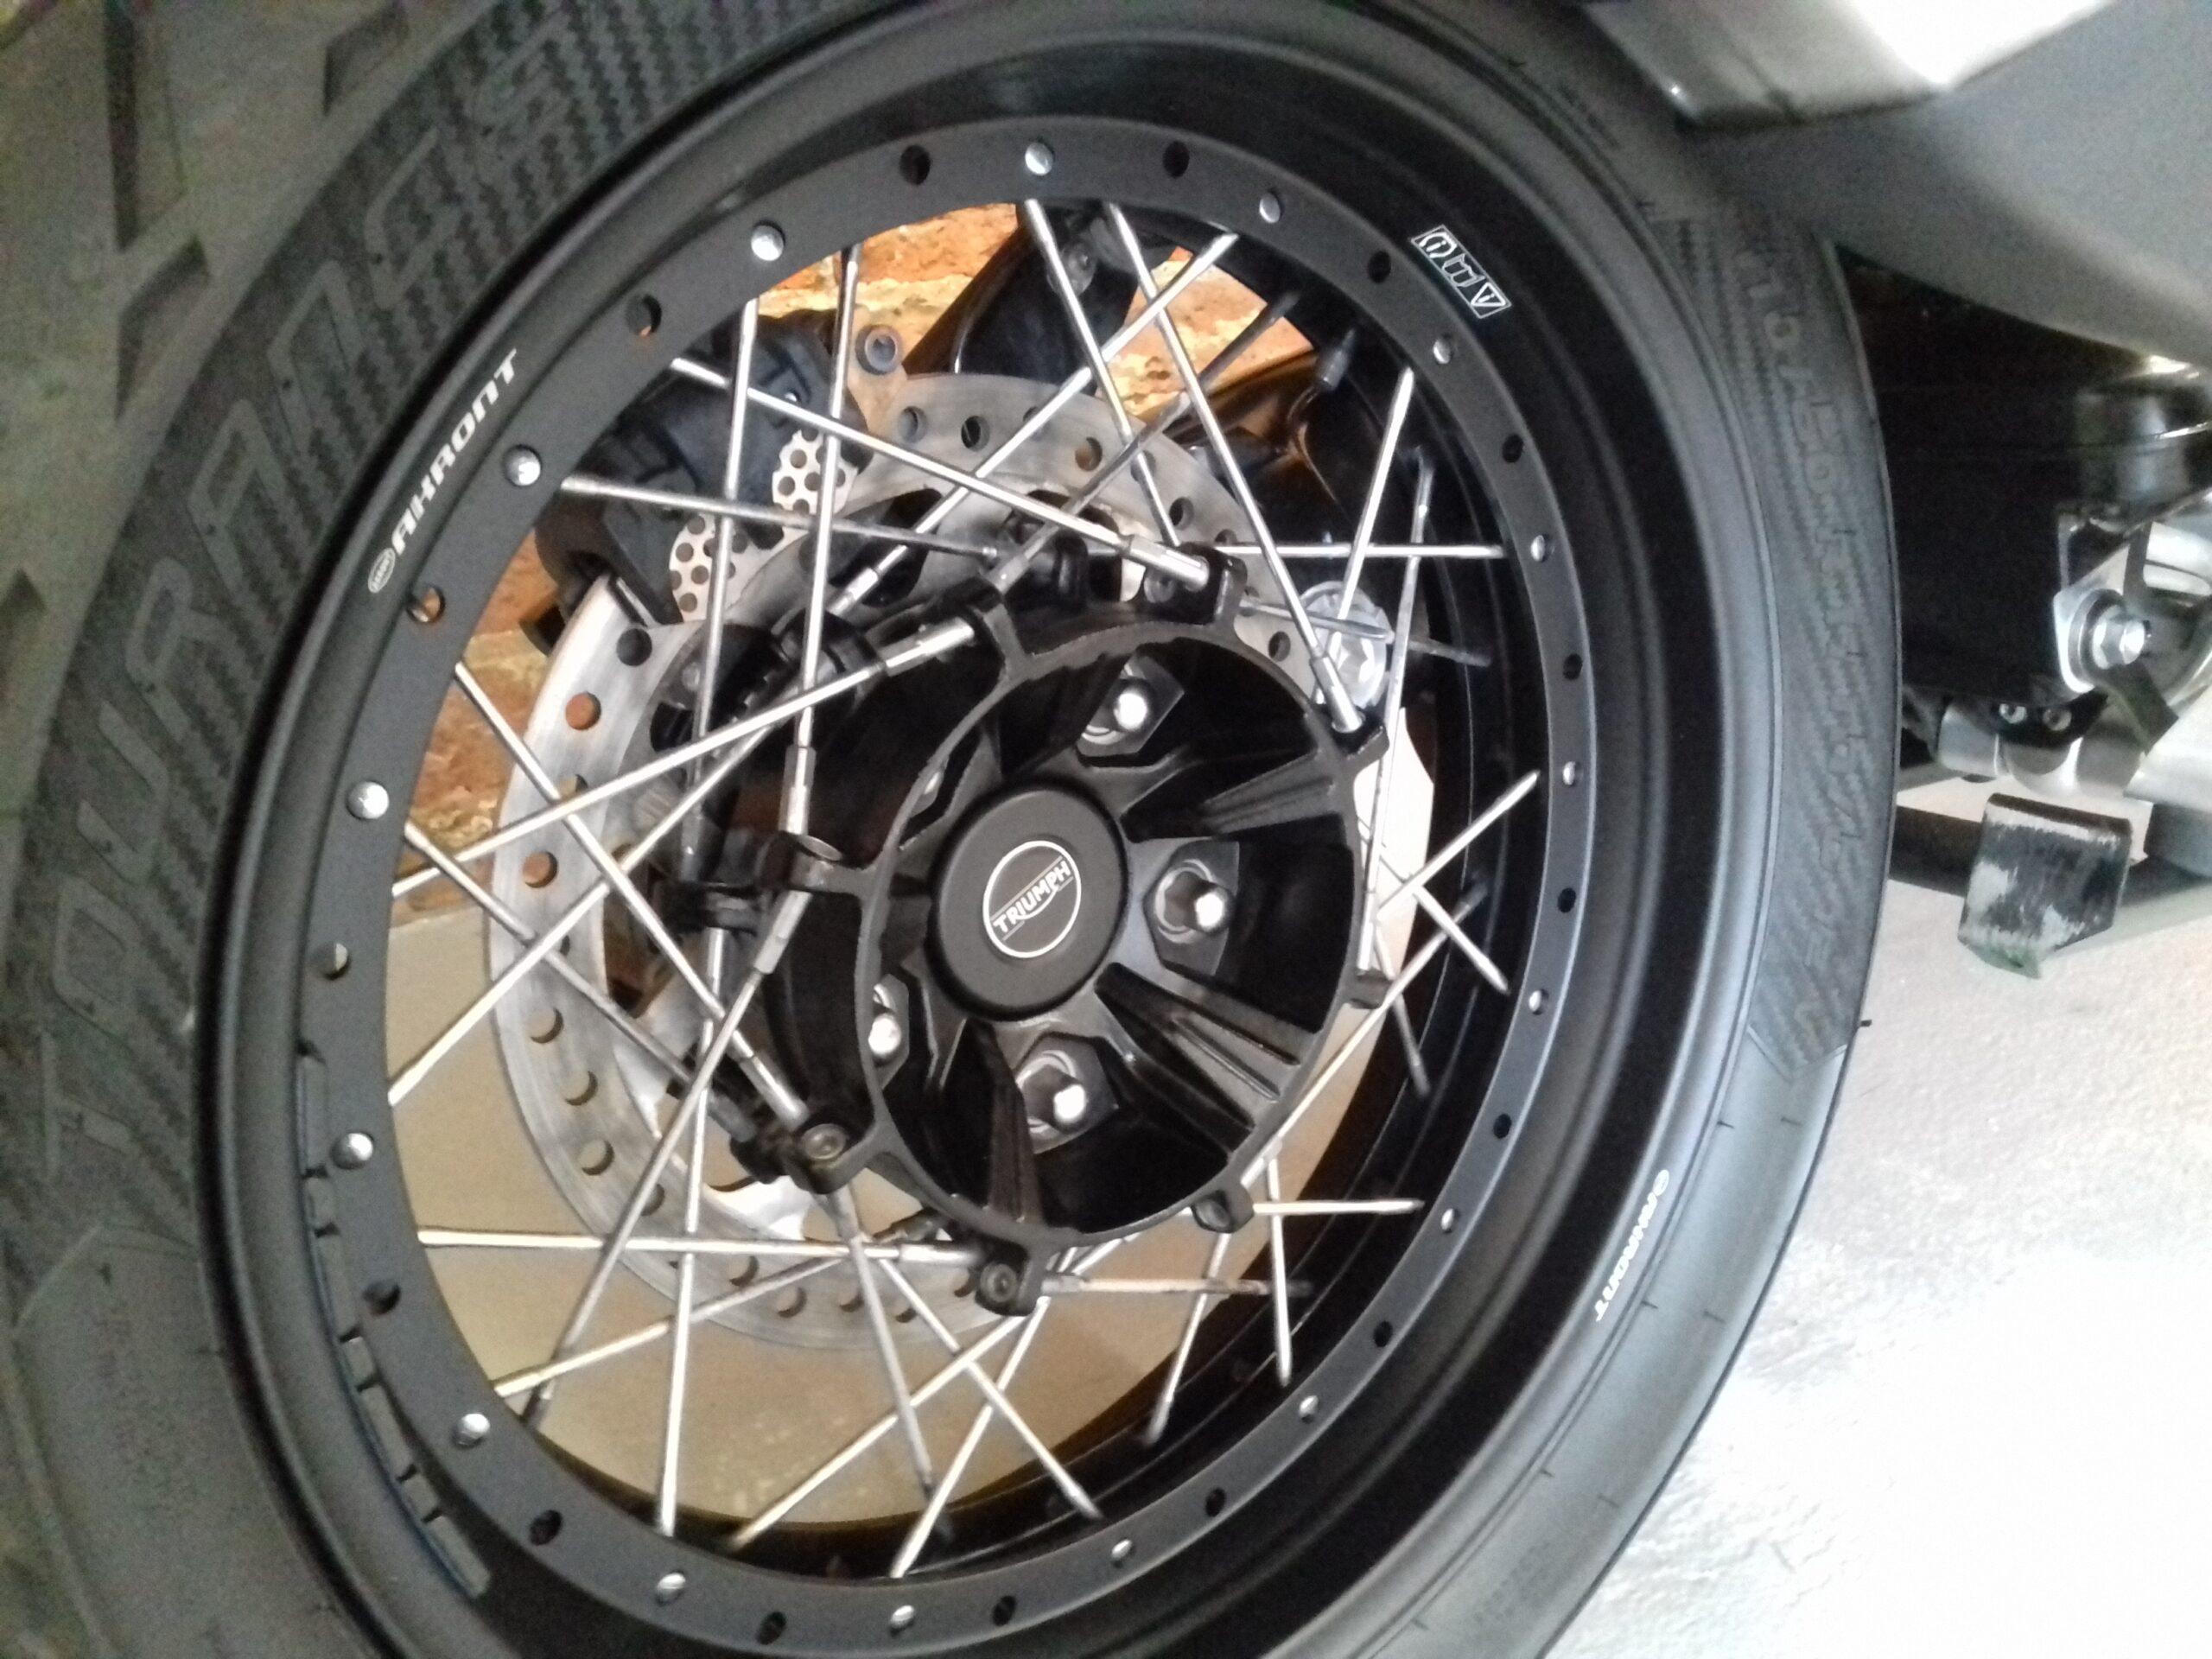 2017 TRIUMPH TIGER EXPLORER 1200 XCA 1215 XCA FULL LUGGAGE ULTRA LOW MILEAGE